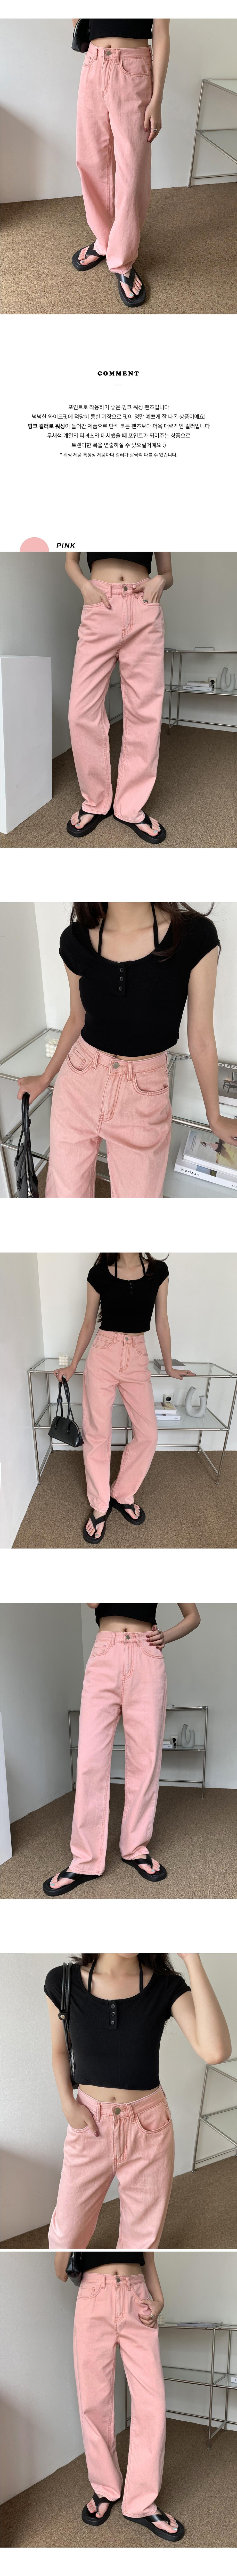 Moak Pink Pigment Faded Wide Long Denim Pants